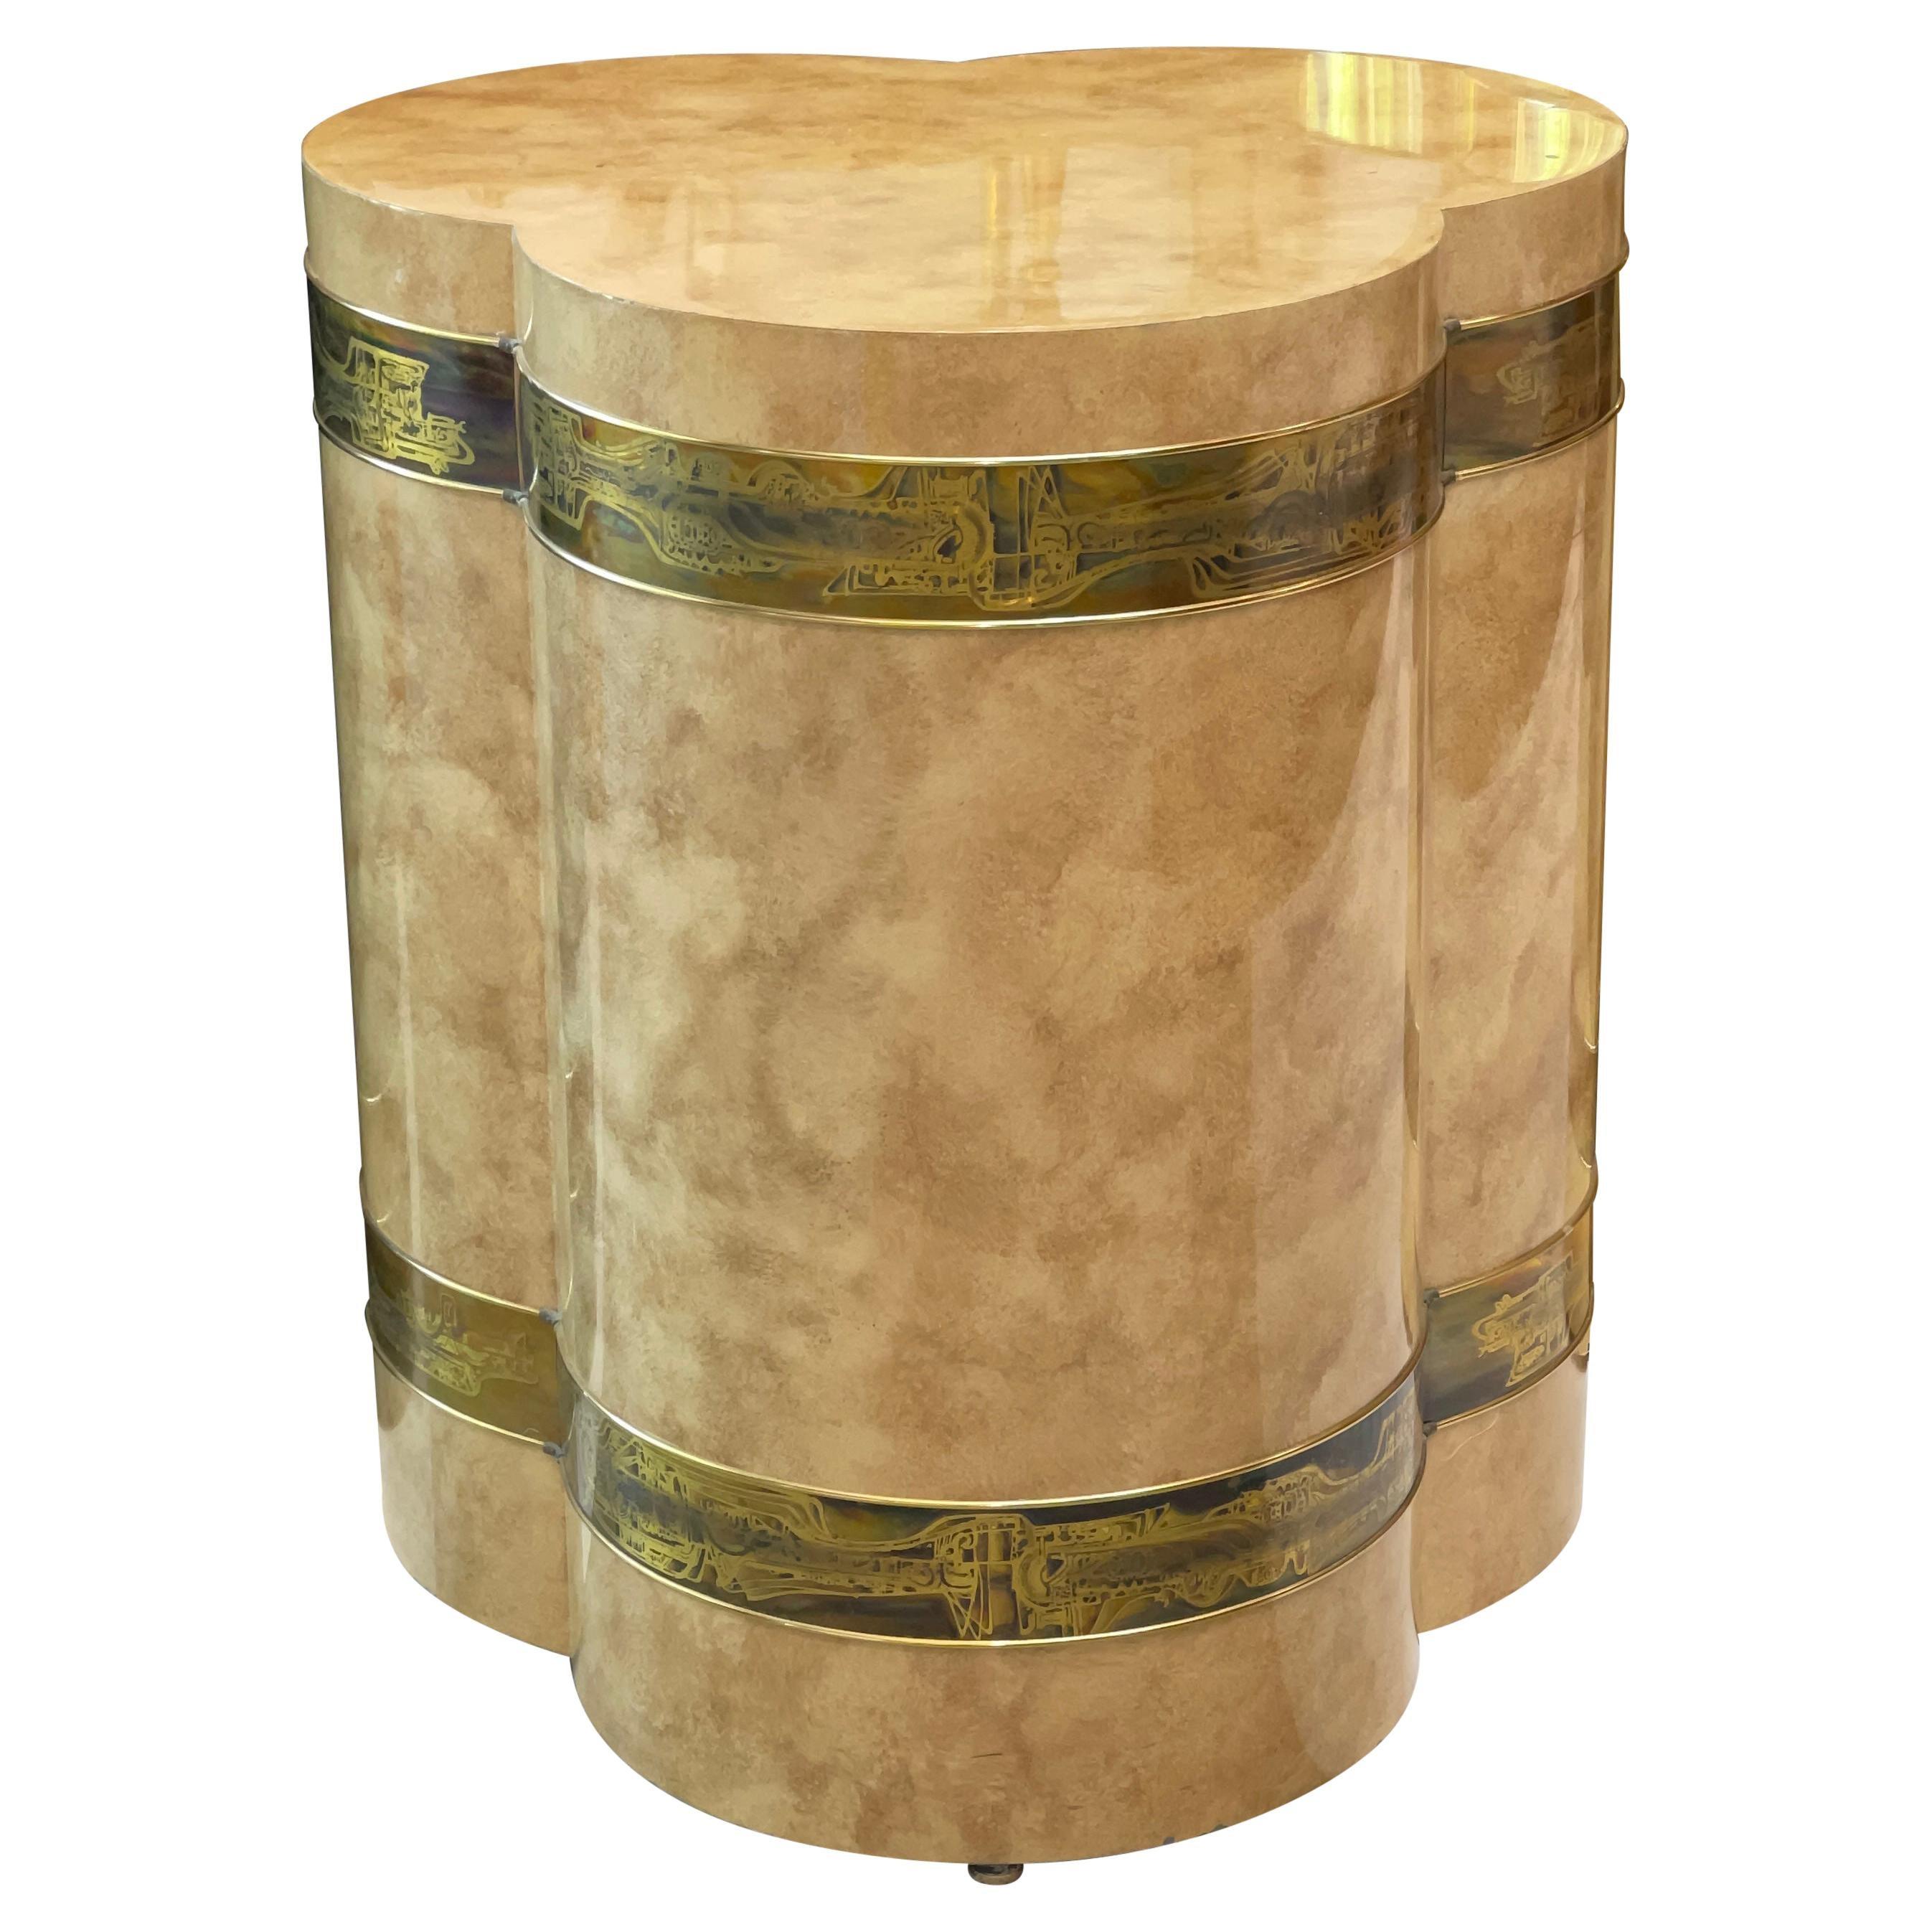 Bernhard Rohne for Mastercraft Trefoil Trifoliate Clover Pedestal Drum Table